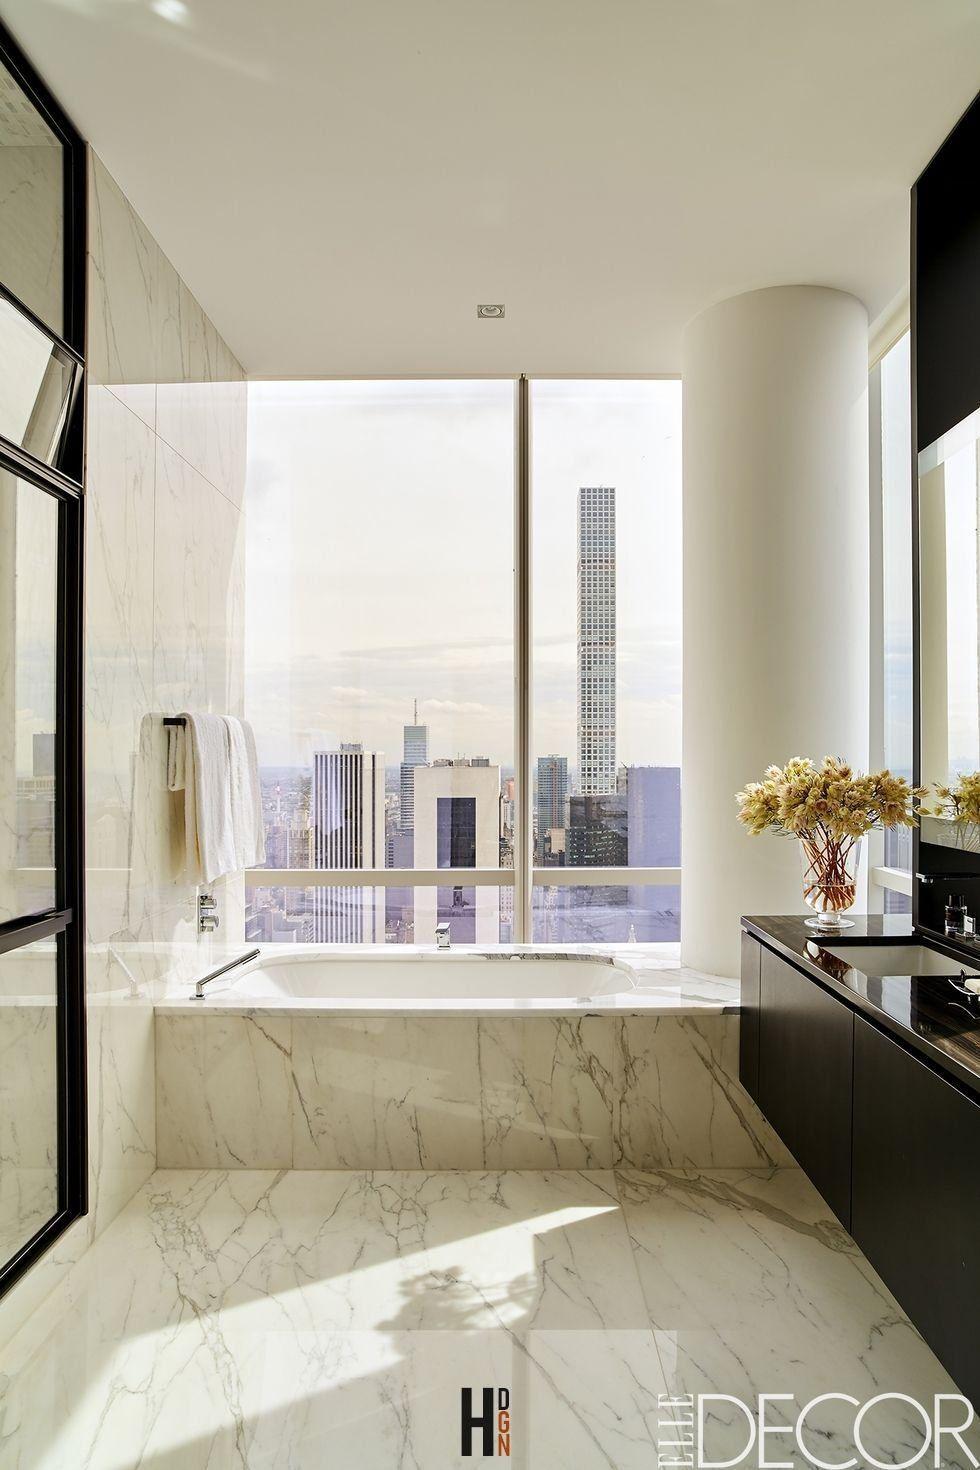 25 White Bathroom Design Ideas – Decorating Tips for All White … #25 ...